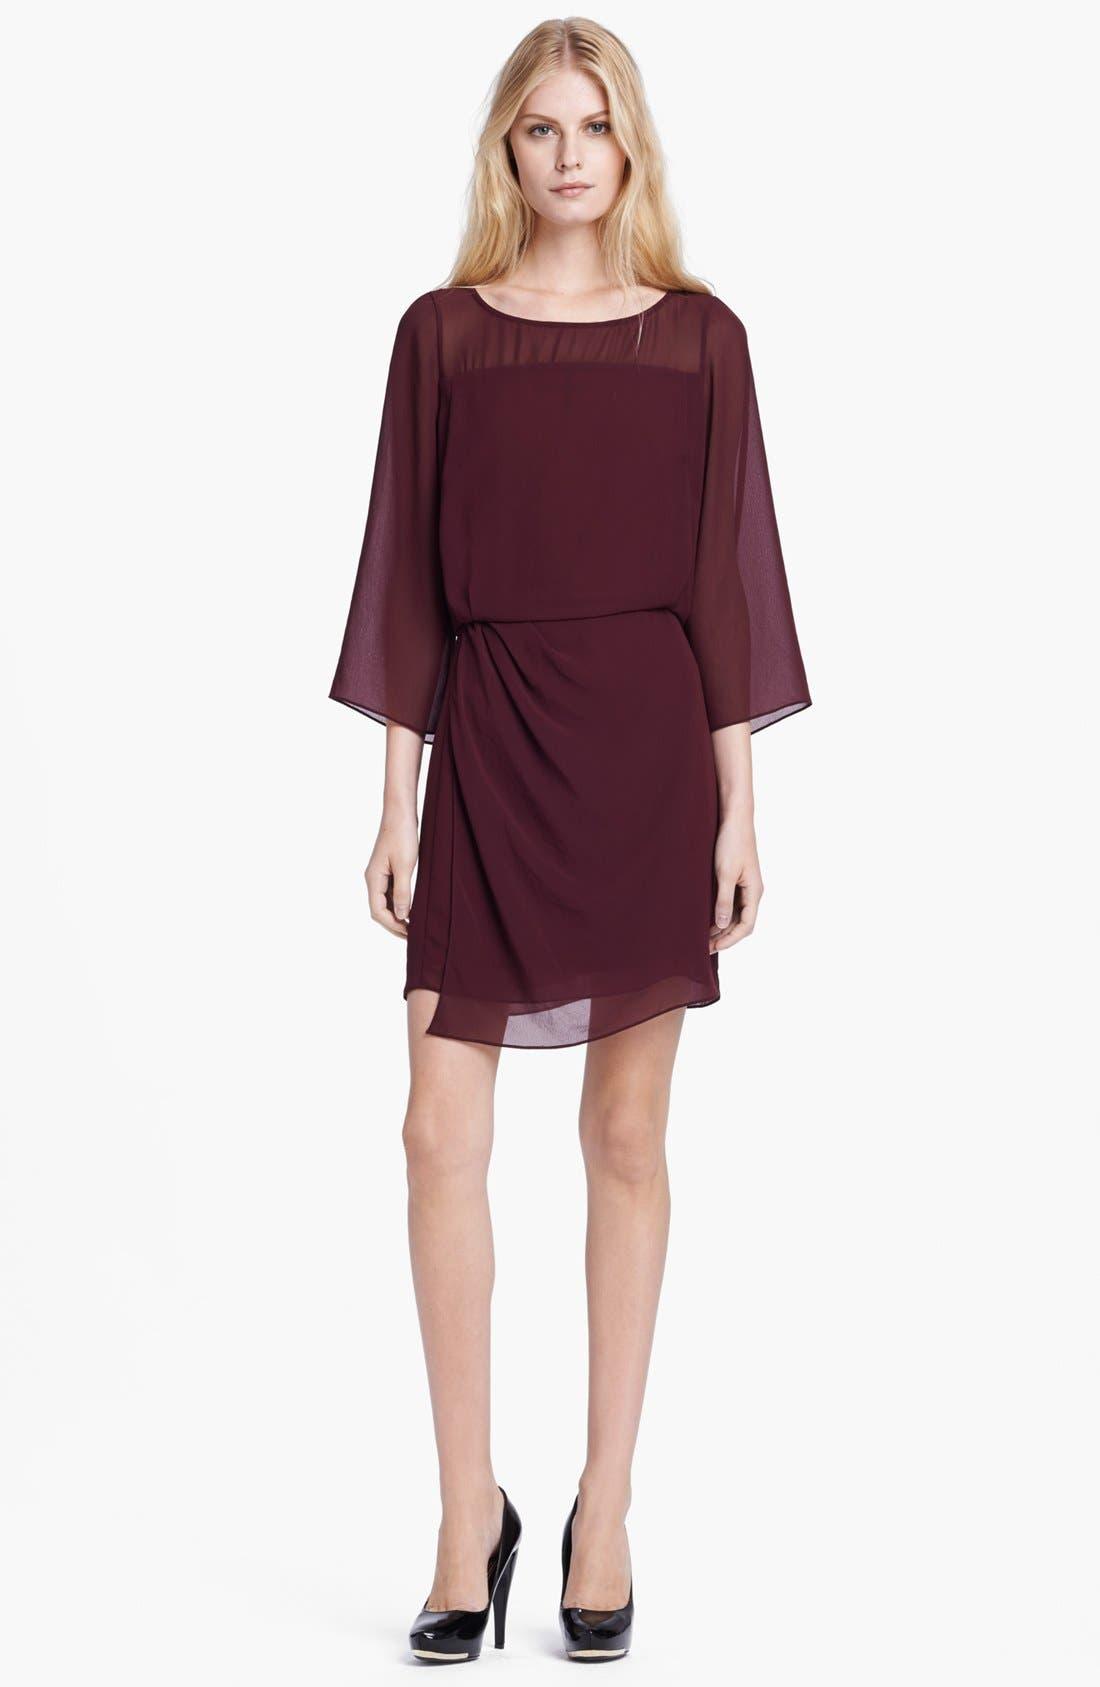 Alternate Image 1 Selected - Elizabeth and James 'Surai' Silk Dress